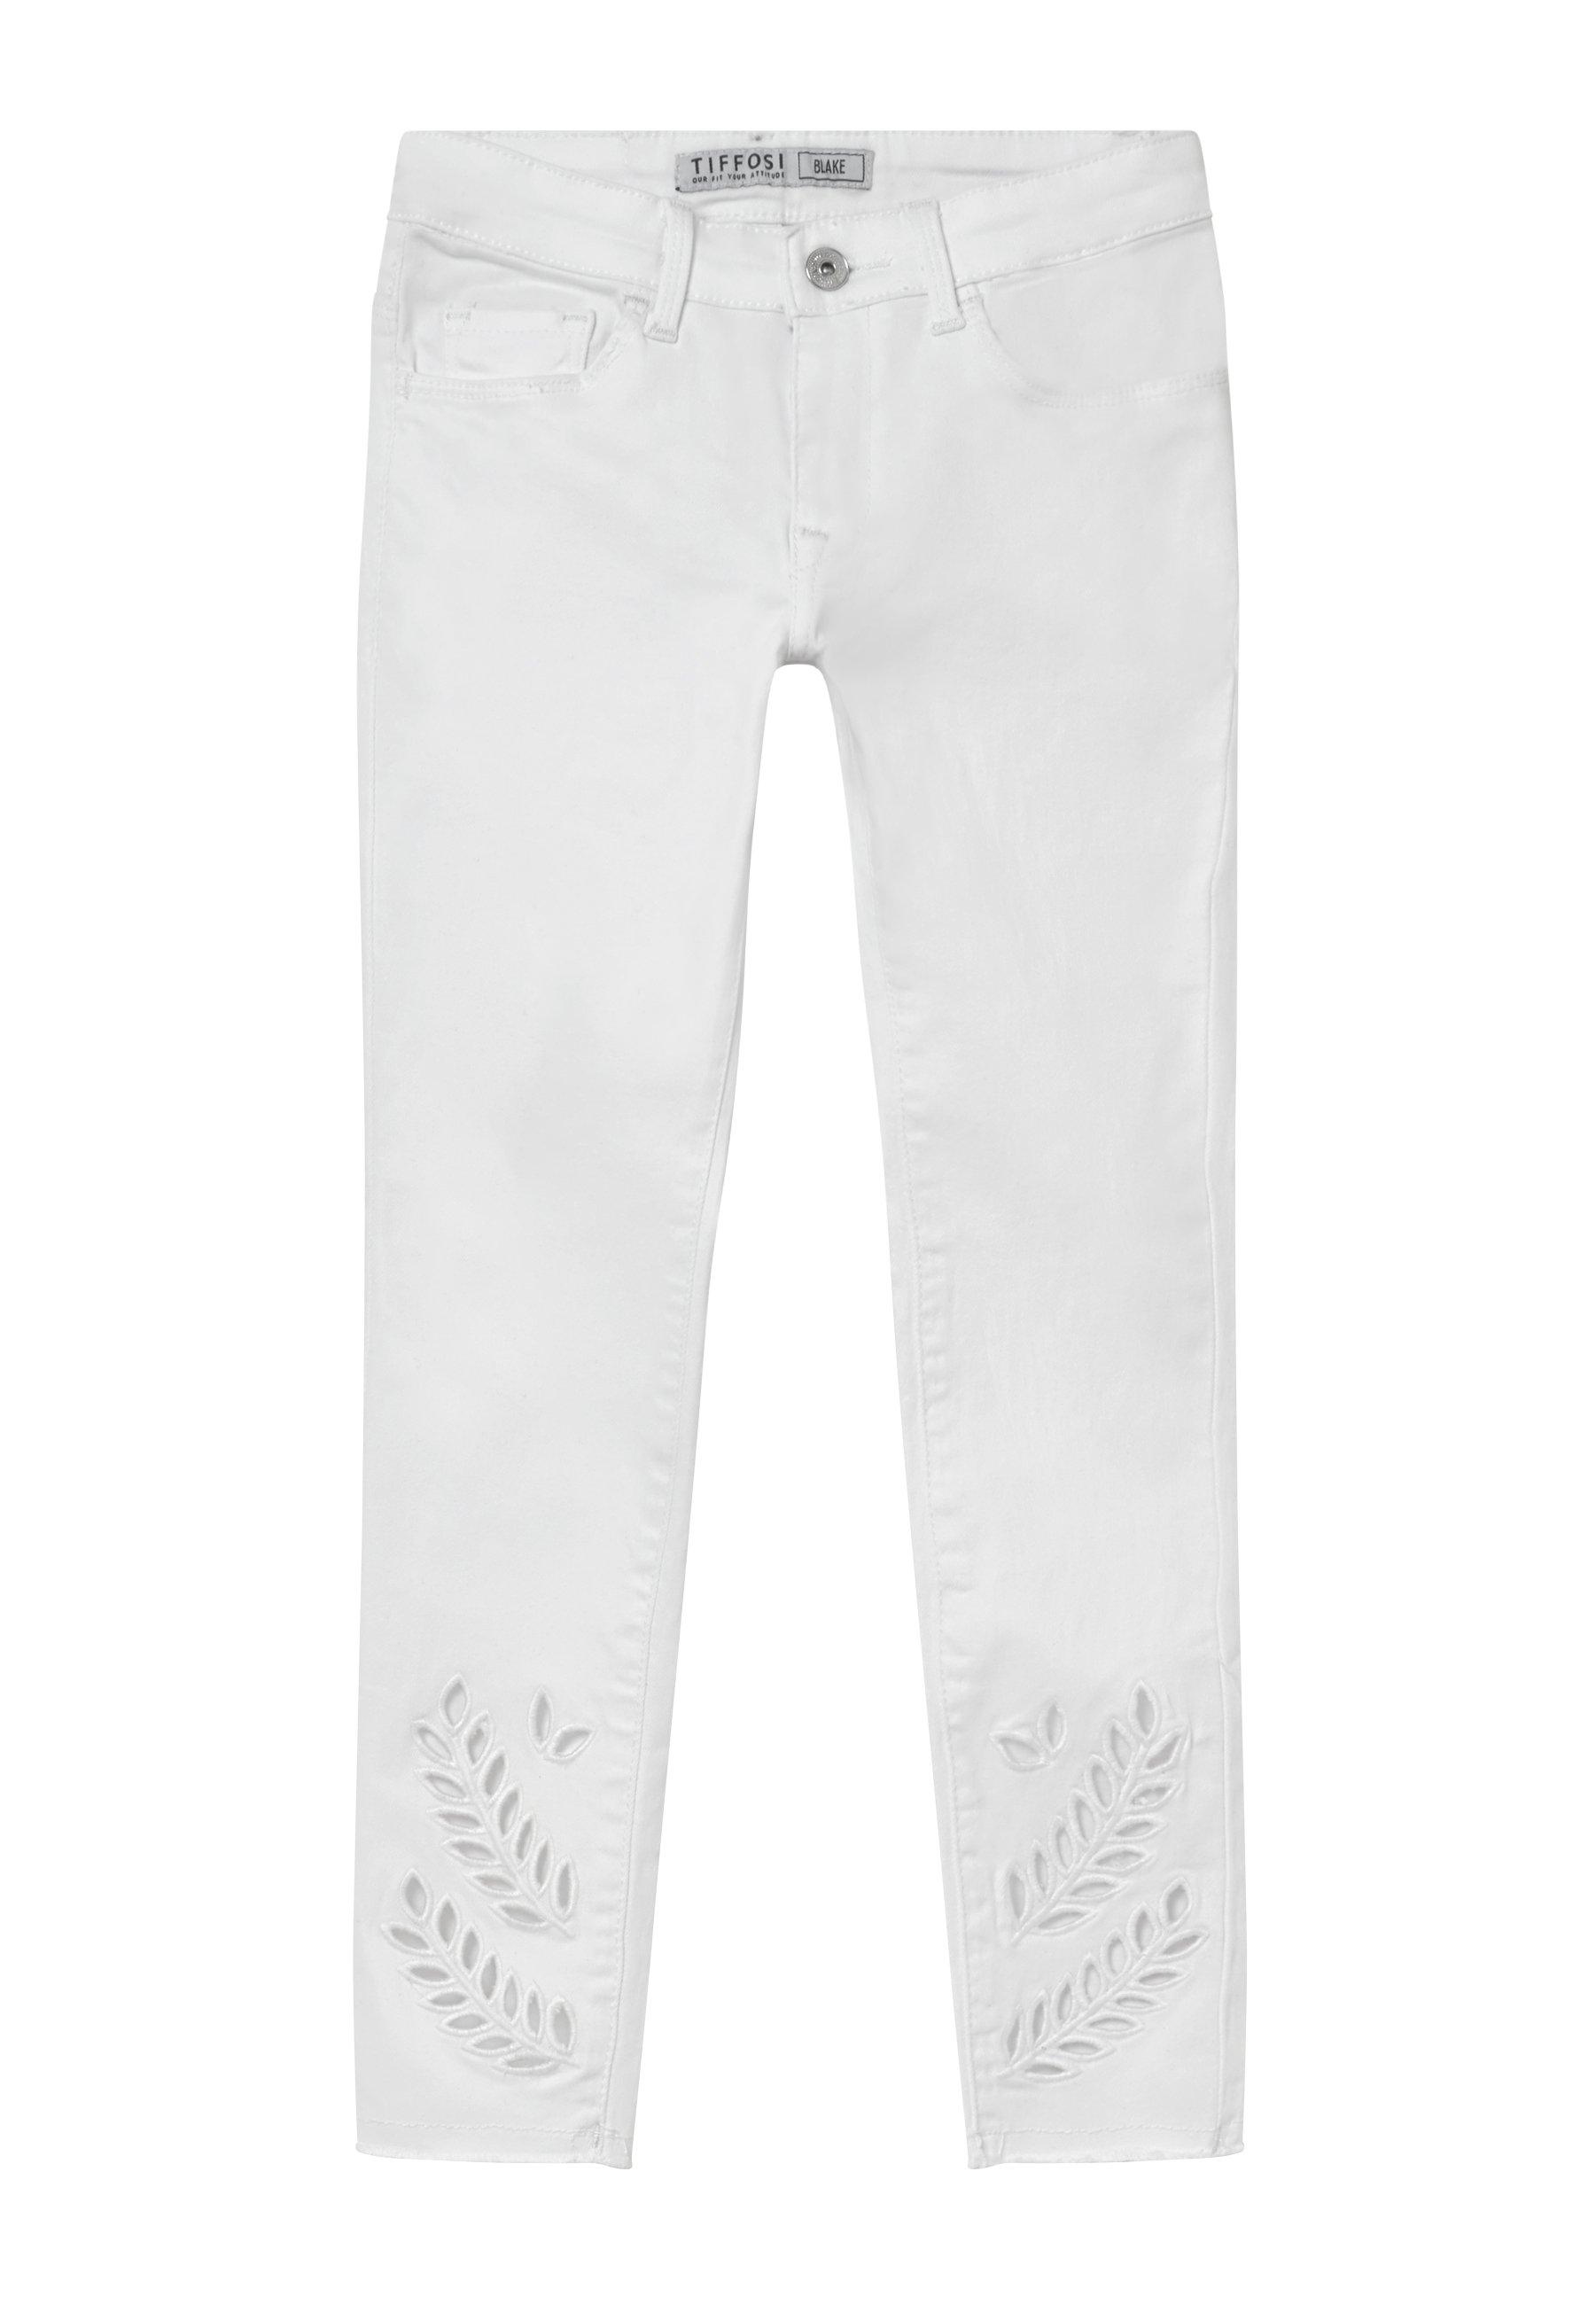 Tiffosi Blake - Jeans Skinny Fit White